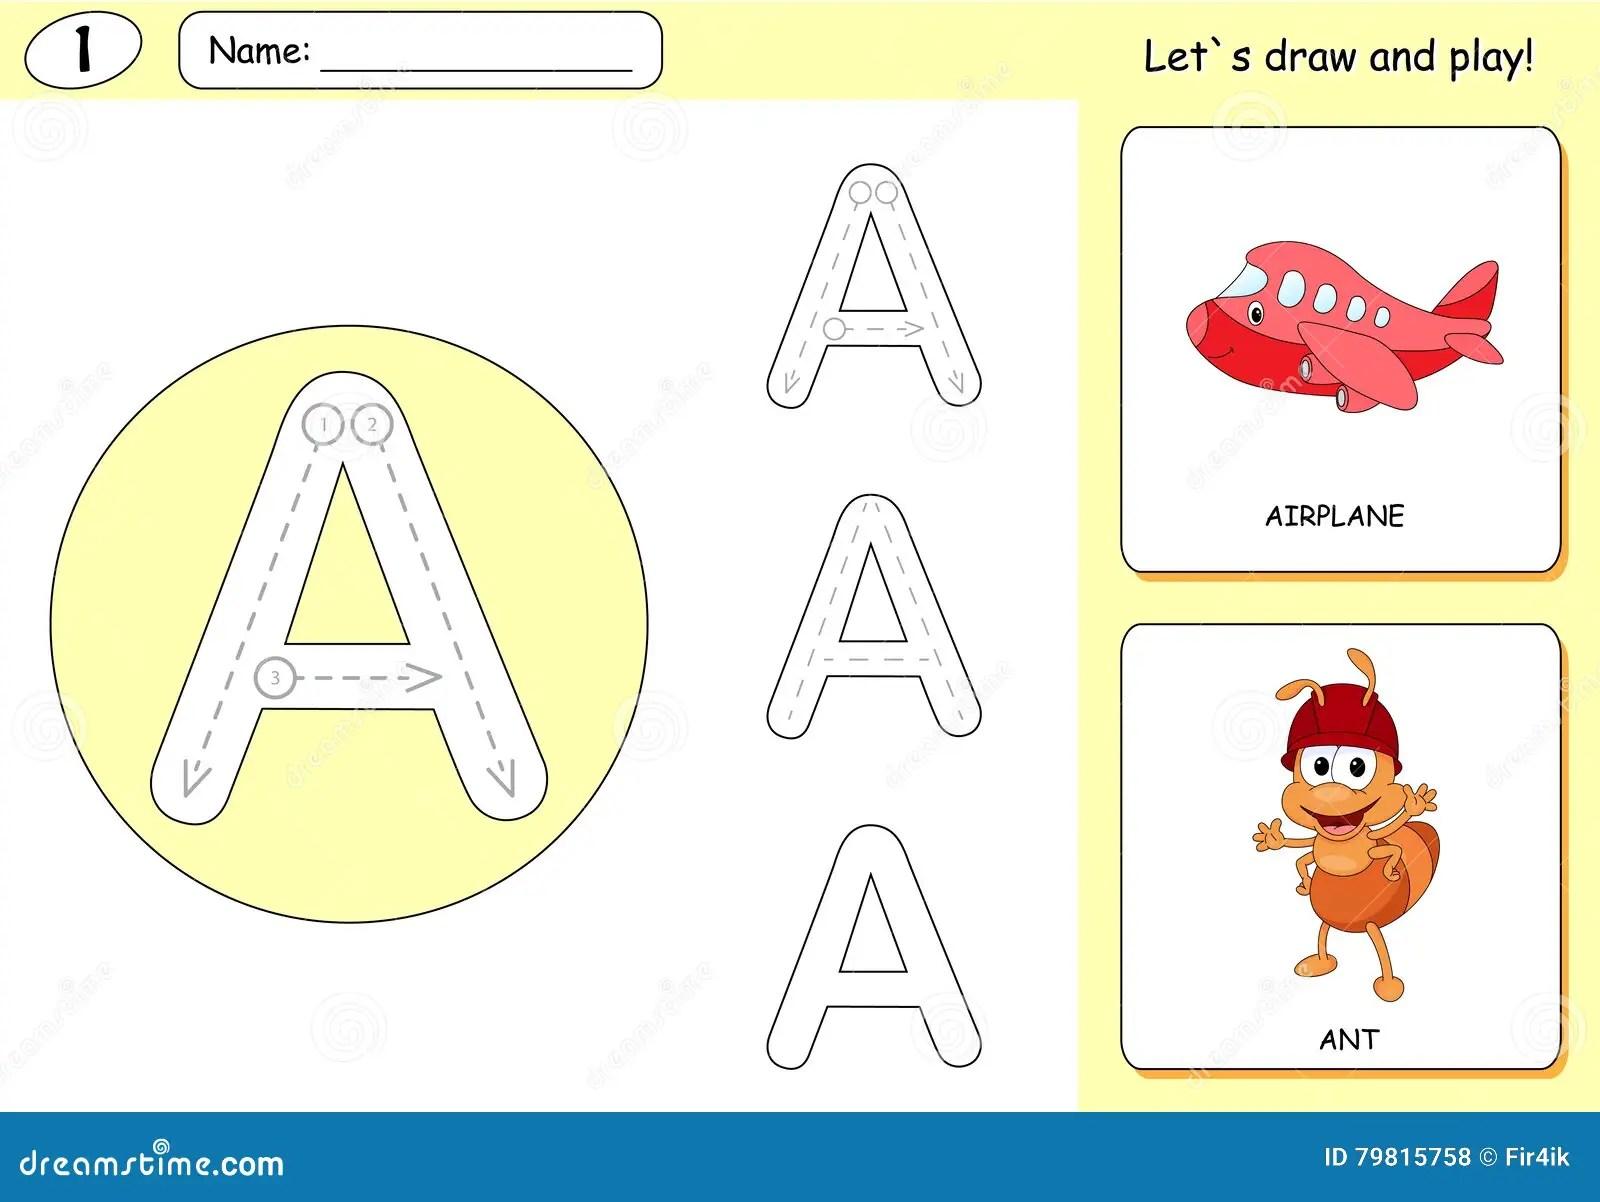 Cartoon Ant And Aircraft Alphabet Tracing Worksheet Stock